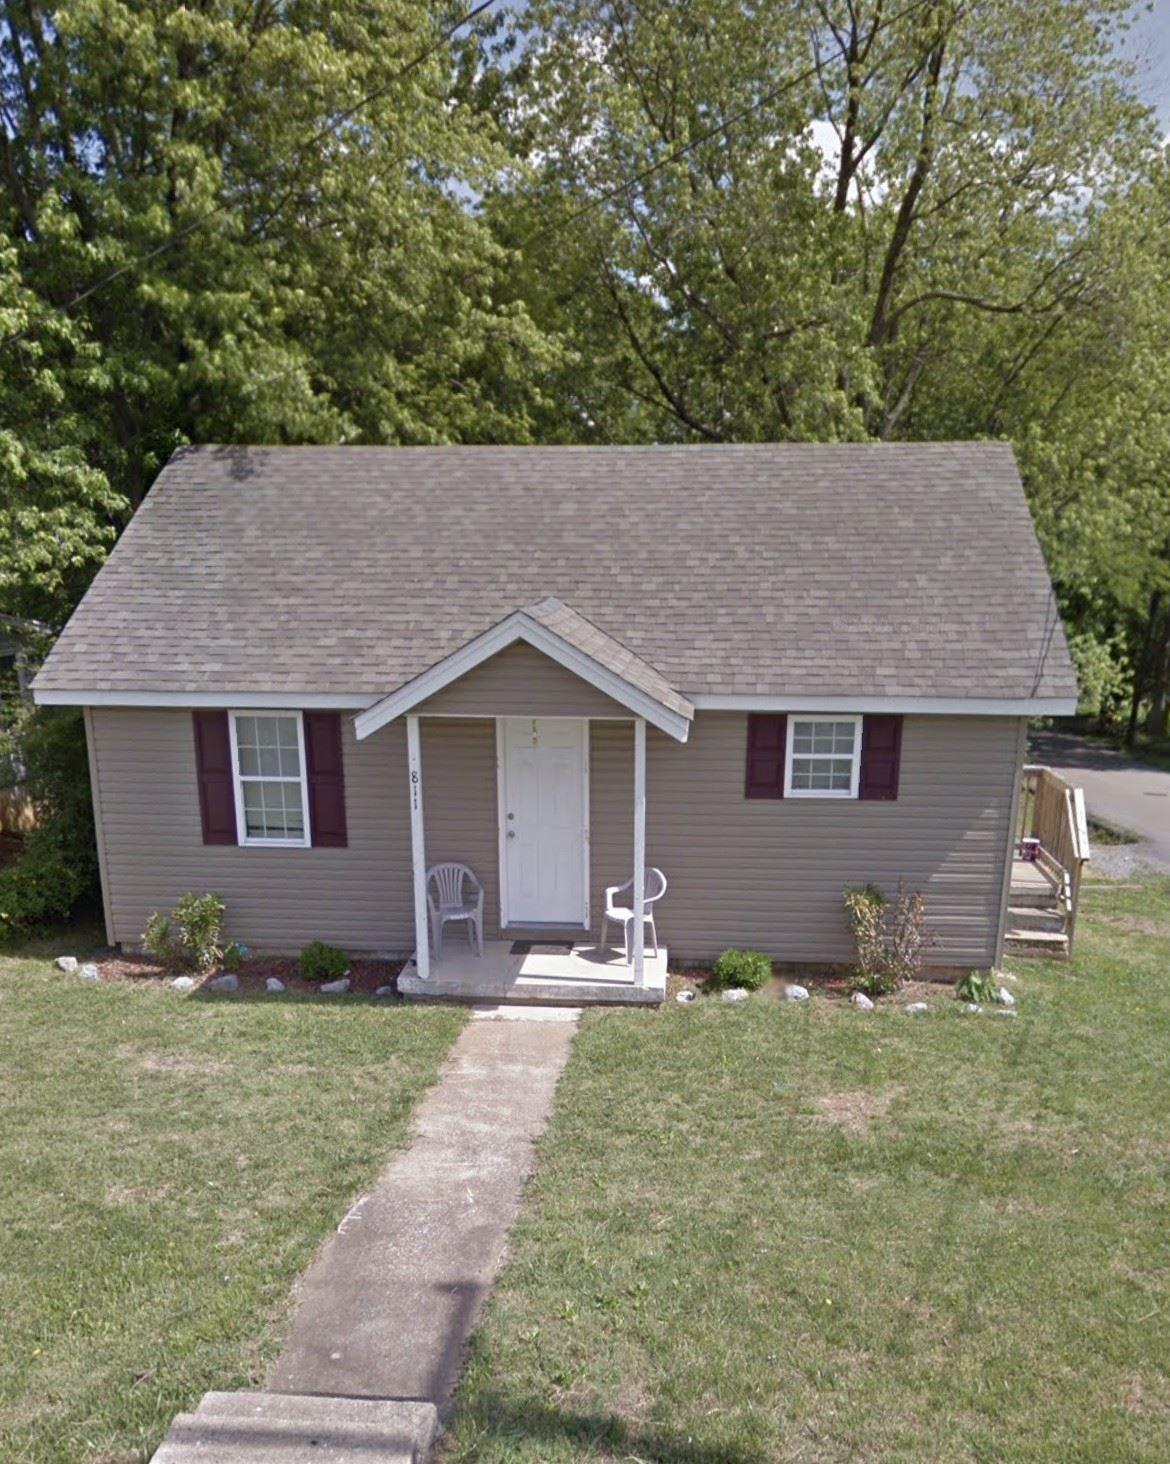 811 17th Ave E, Springfield, TN 37172 - MLS#: 2290784